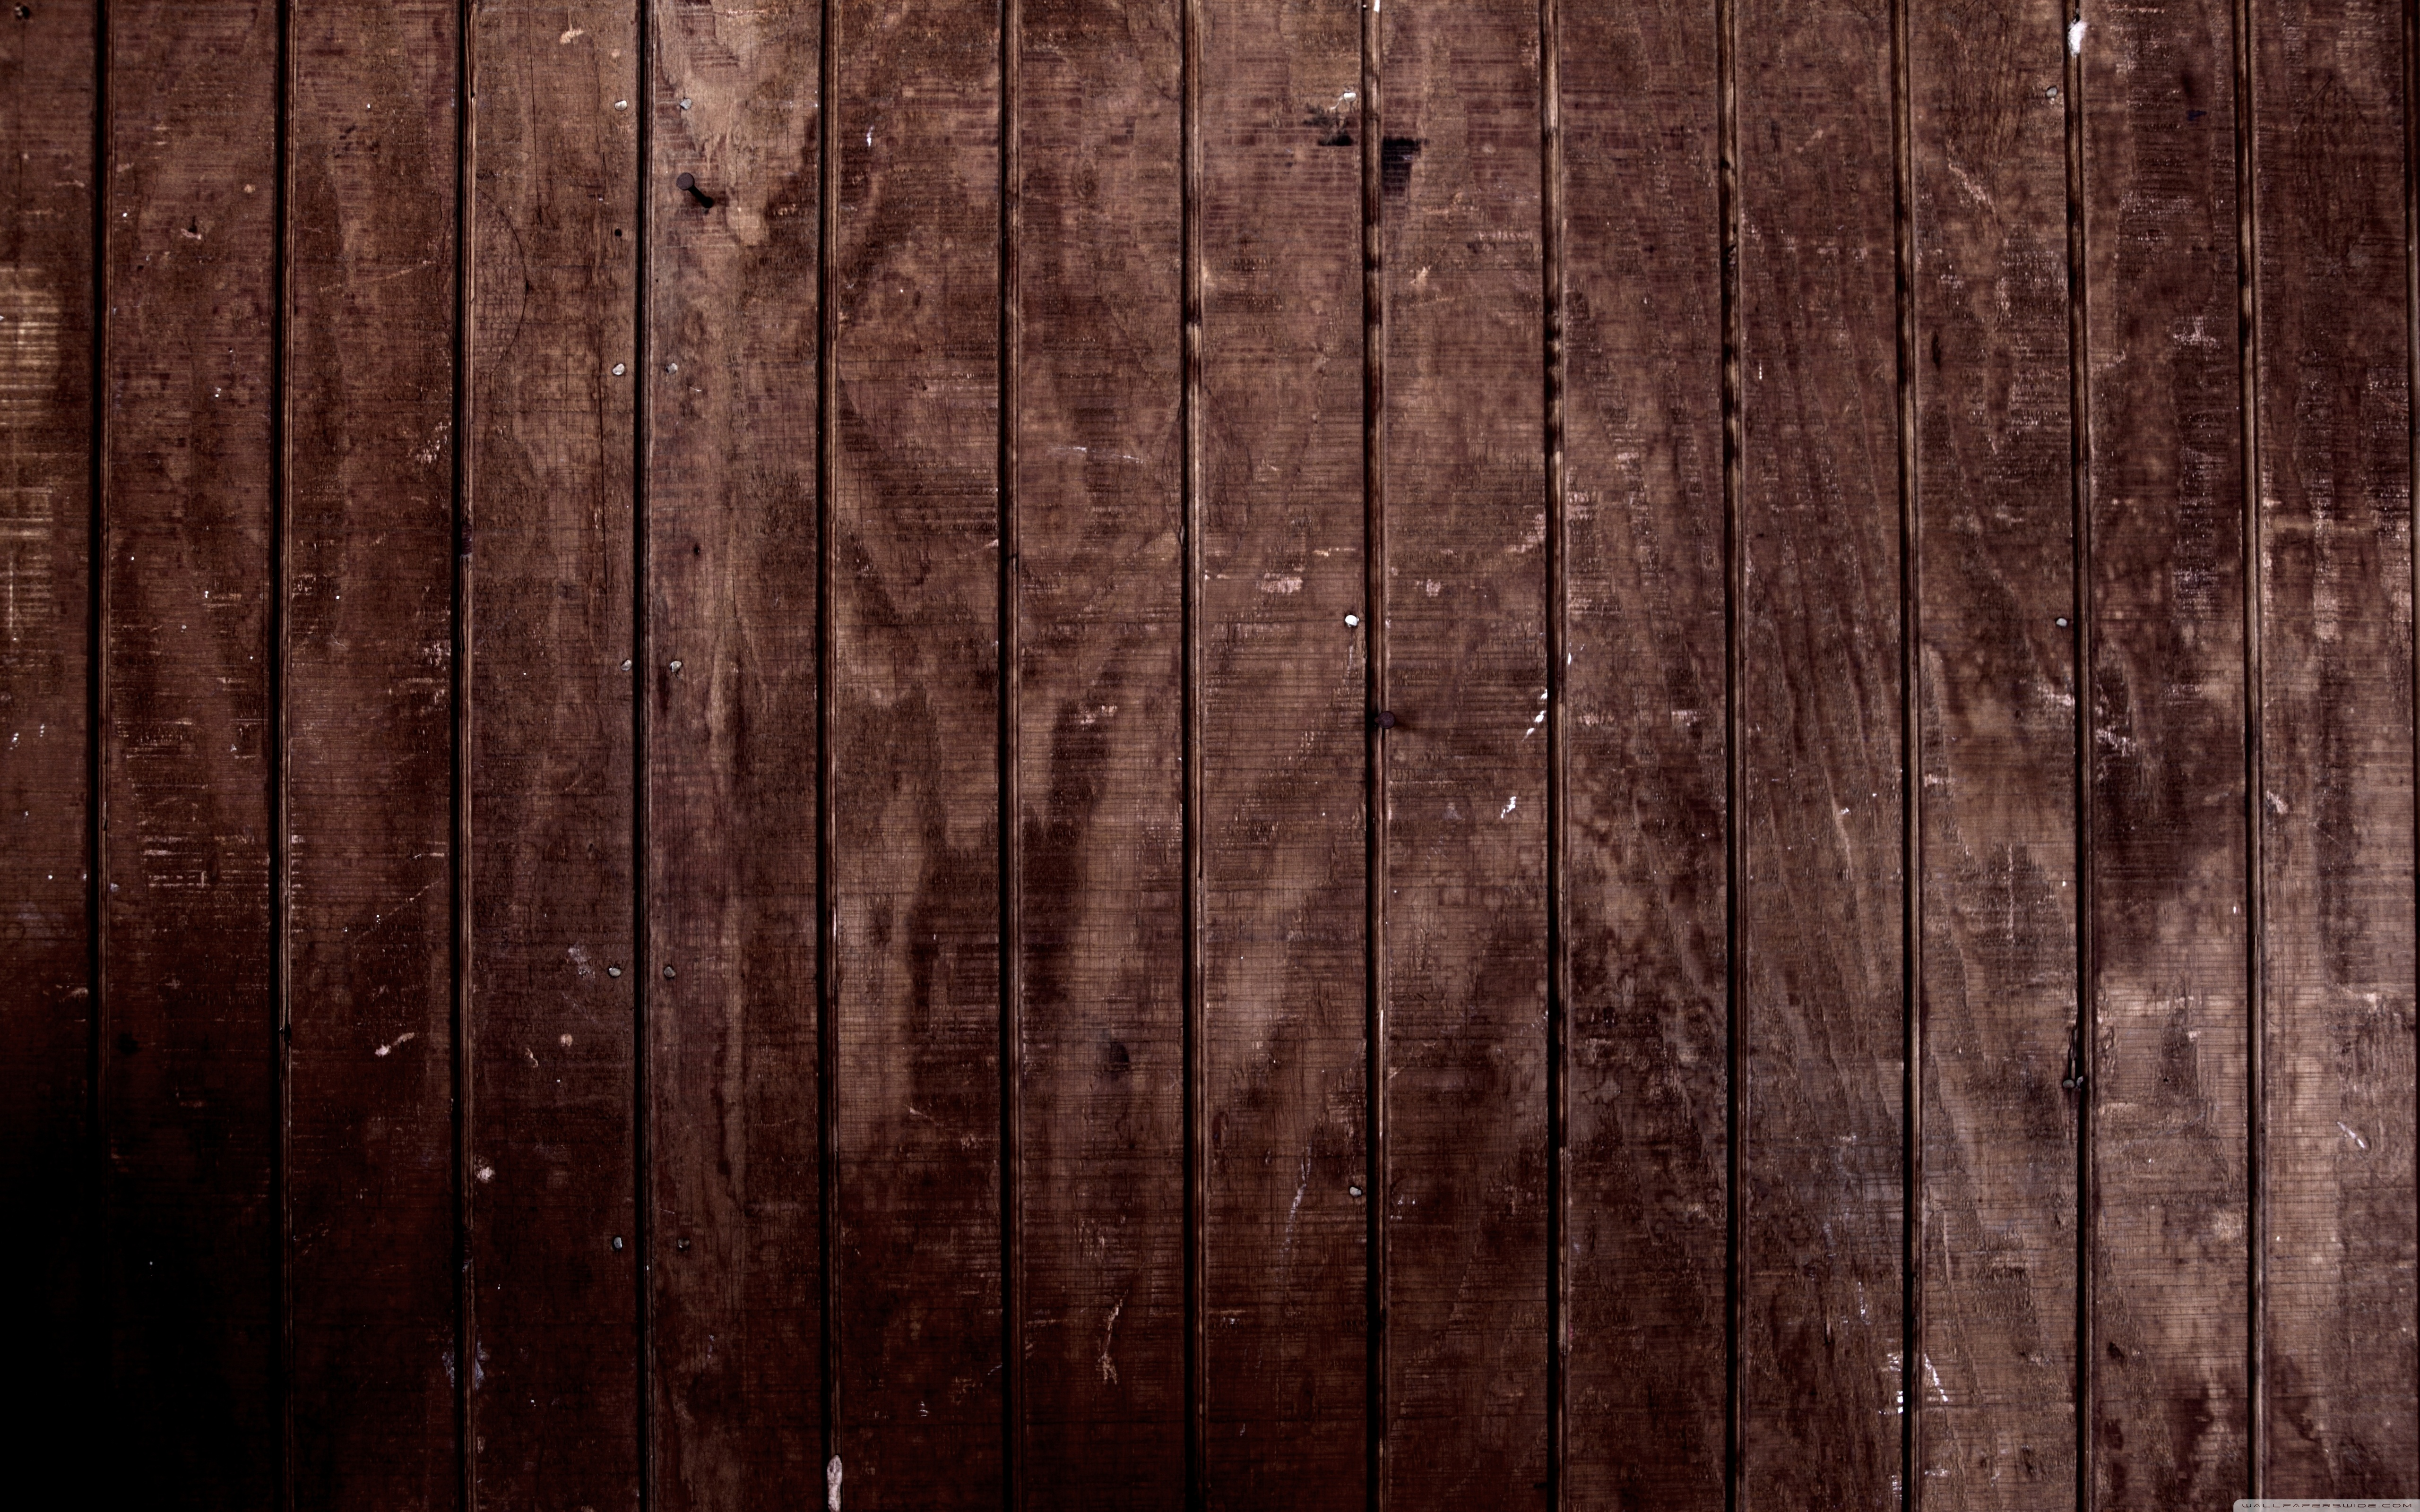 Wooden Panels ❤ 4K HD Desktop Wallpaper for 4K Ultra HD TV • Tablet ...